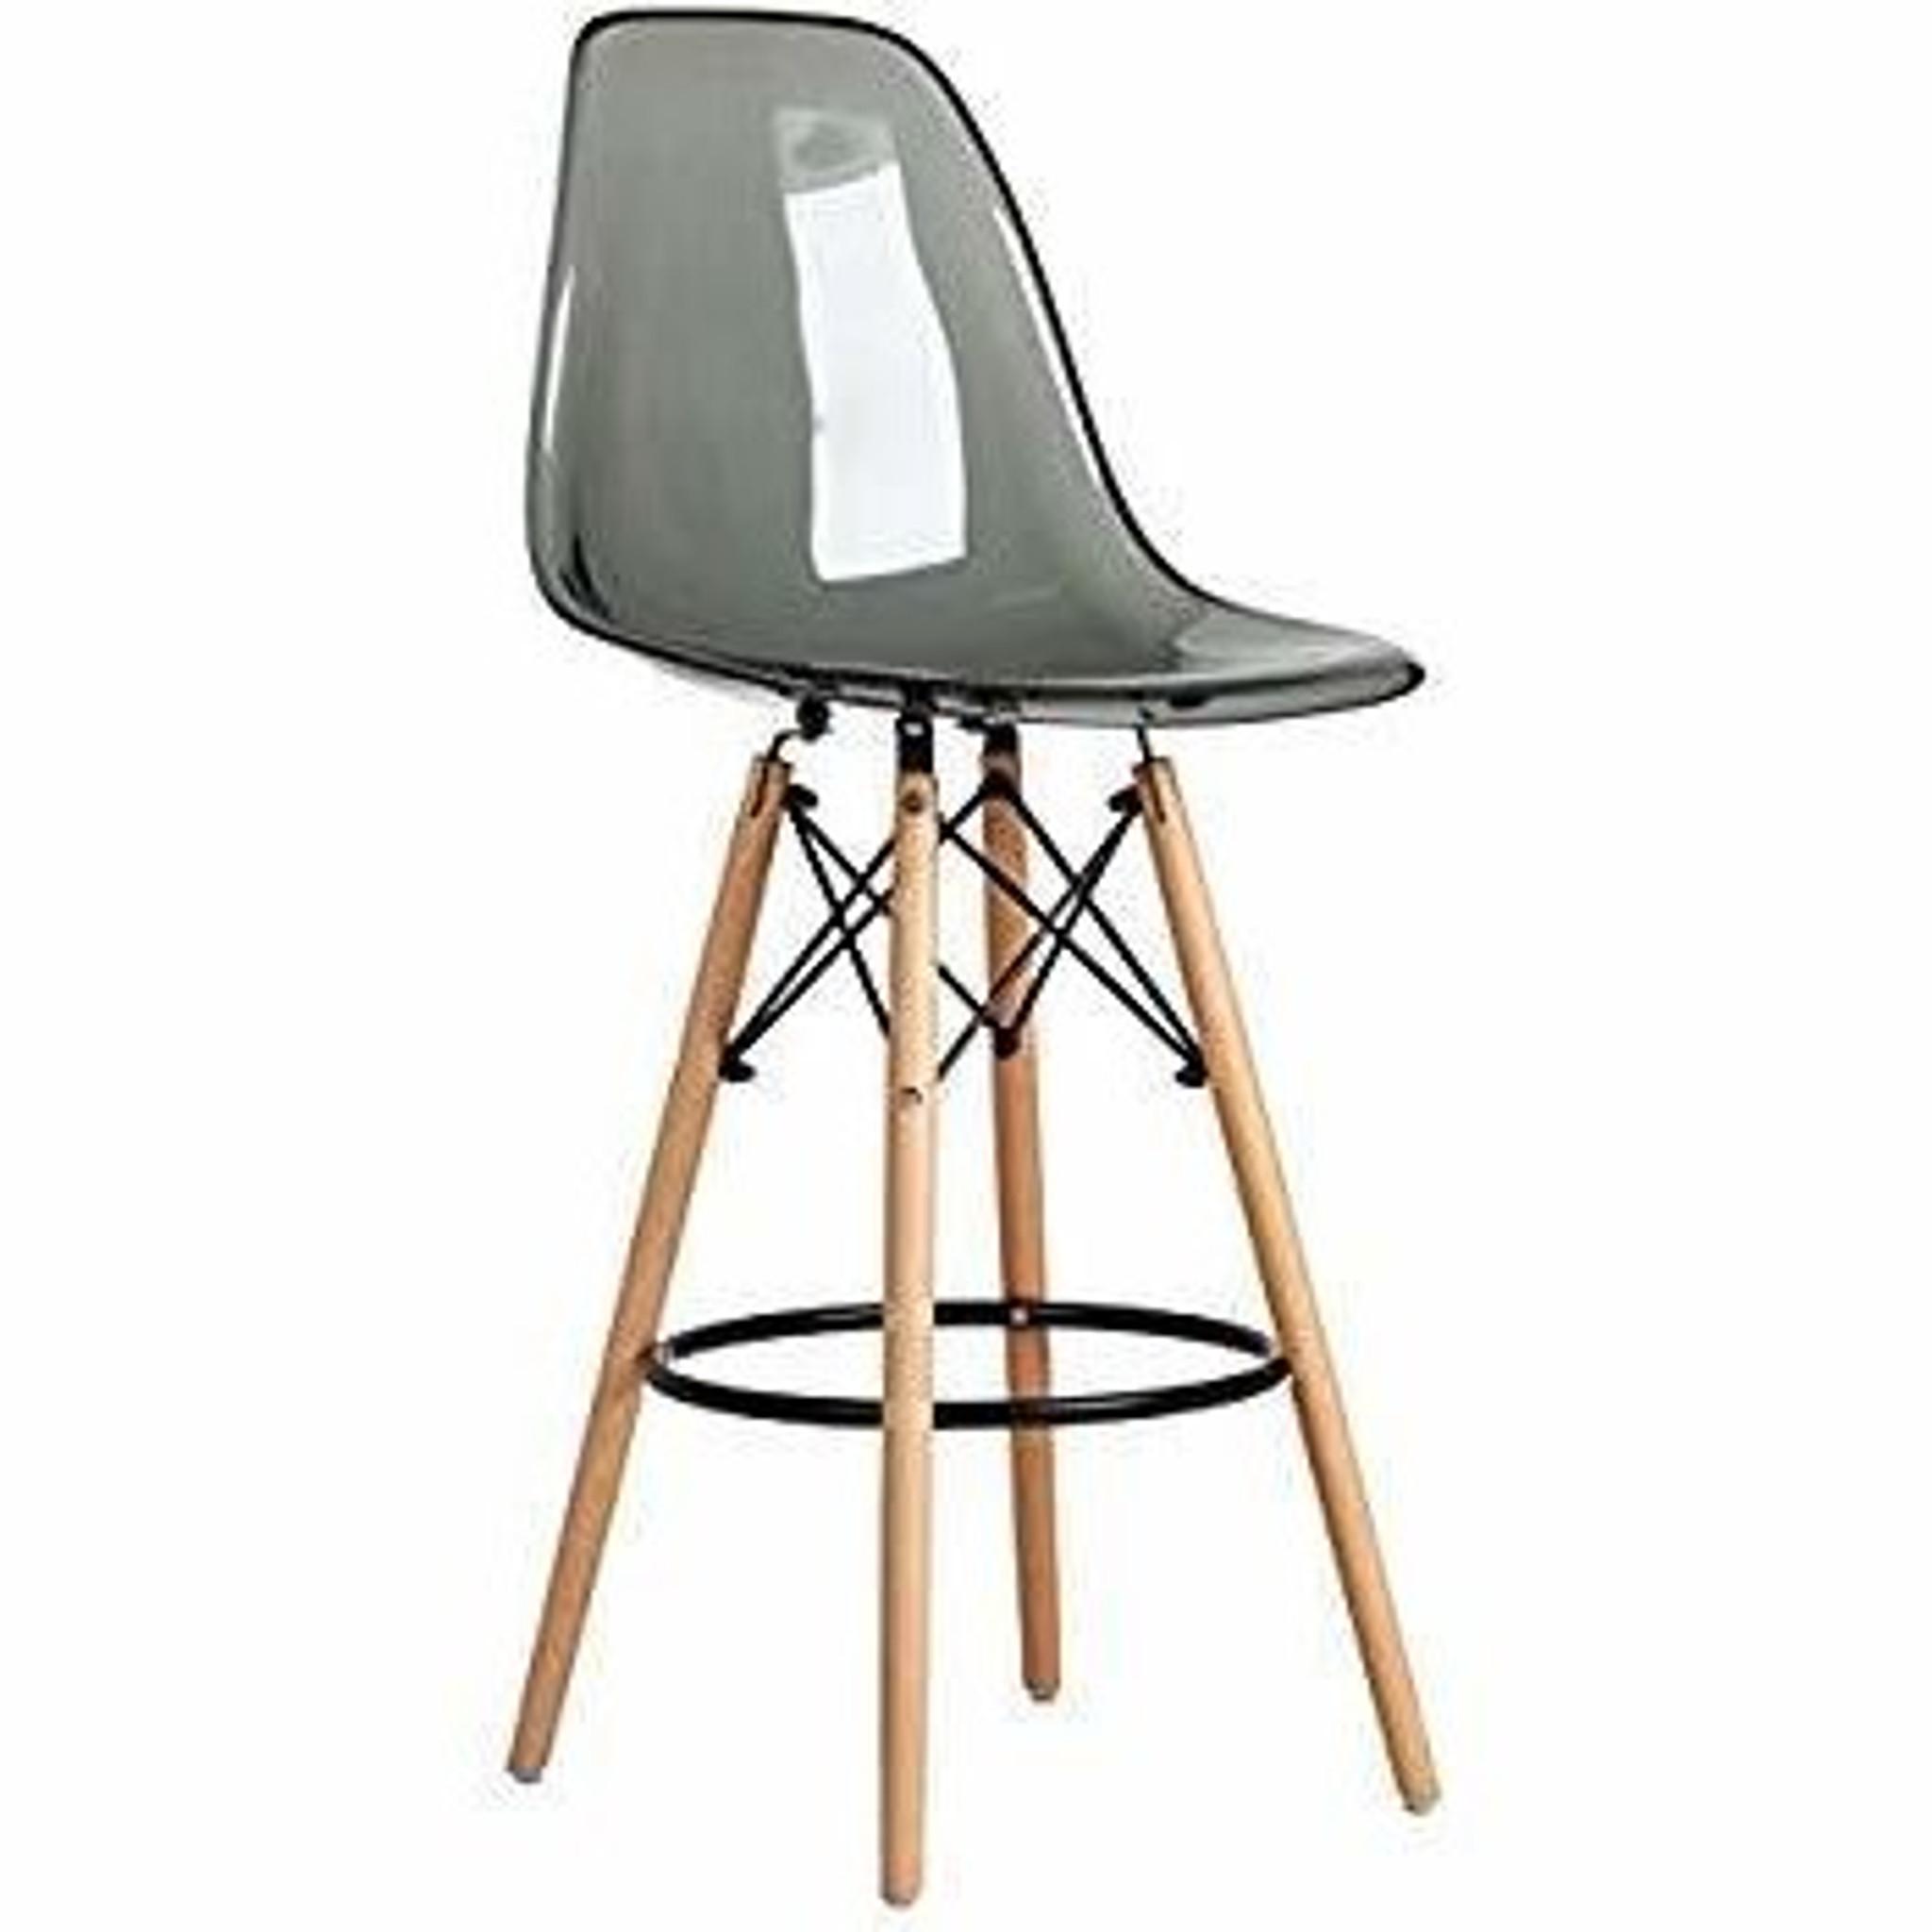 clear acrylic lucite grey eames counter stool replica with wood Eiffel legs  khazana